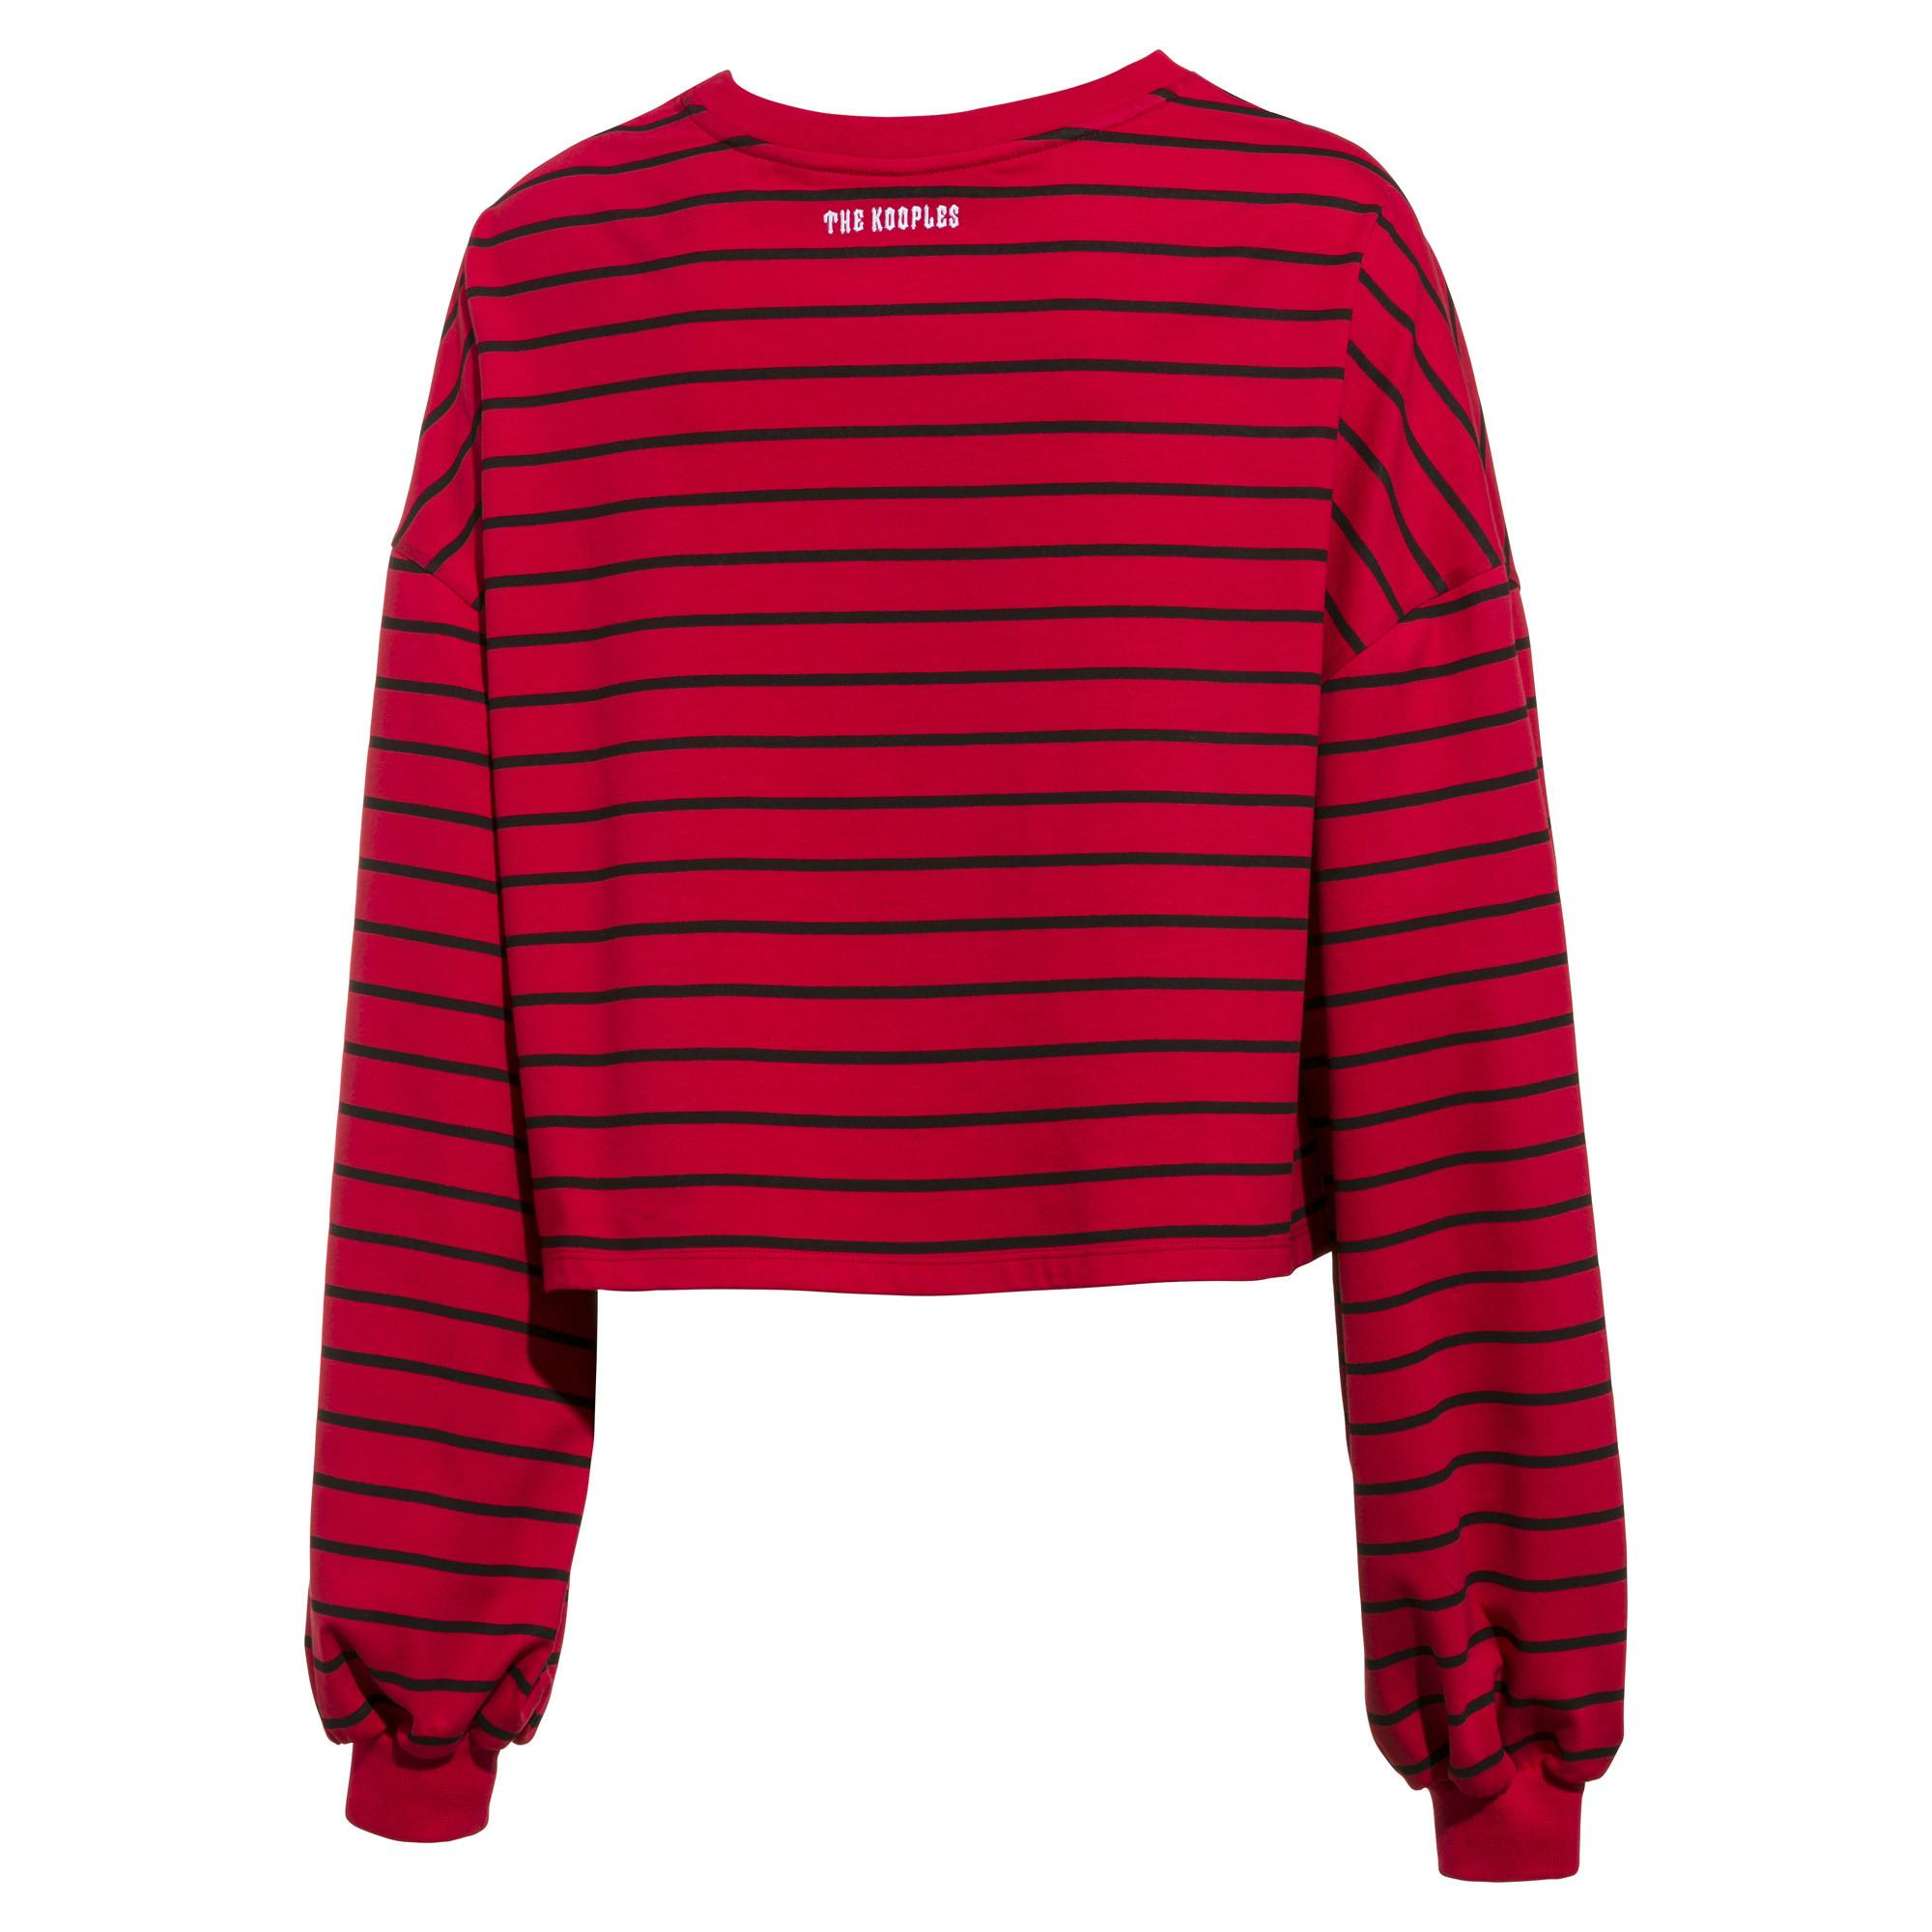 c13ca9410b PUMA X The Kooples Women's Crewneck Sweatshirt in Red - Lyst